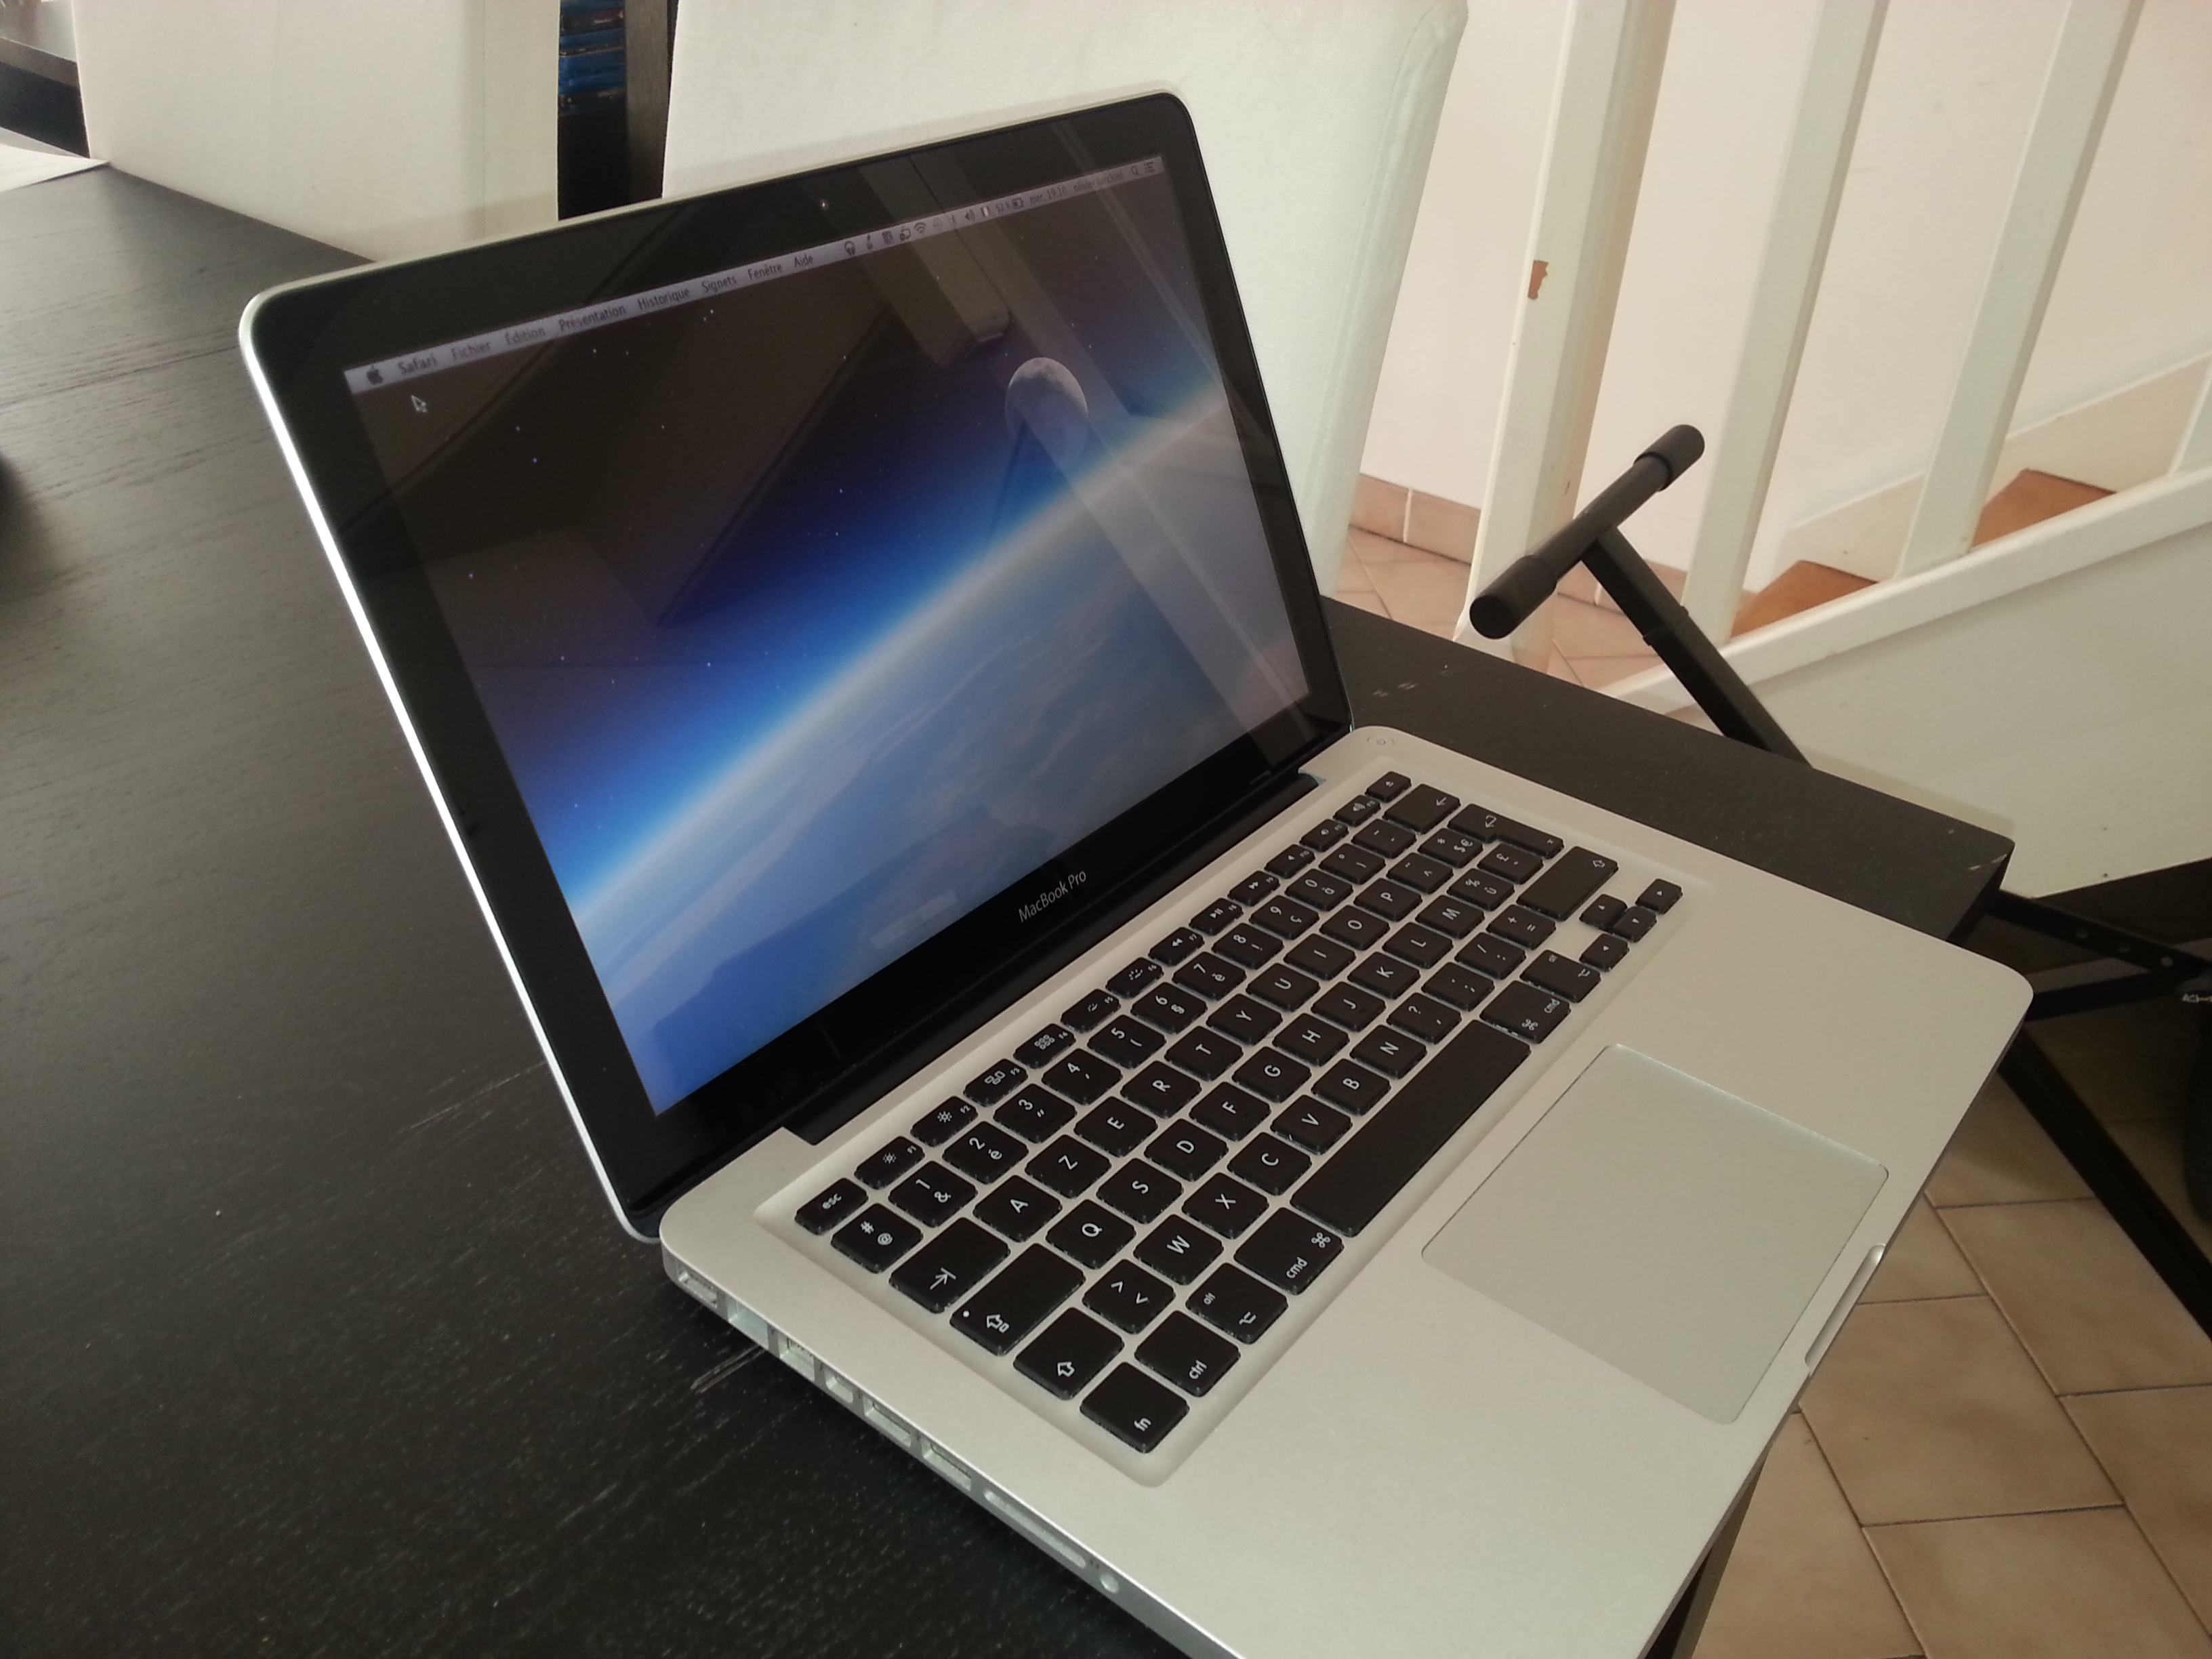 apple macbook pro 13 3 2 53ghz image 626869 audiofanzine rh en audiofanzine com Apple MacBook Pro 13 MacBook Air Pro 13 3